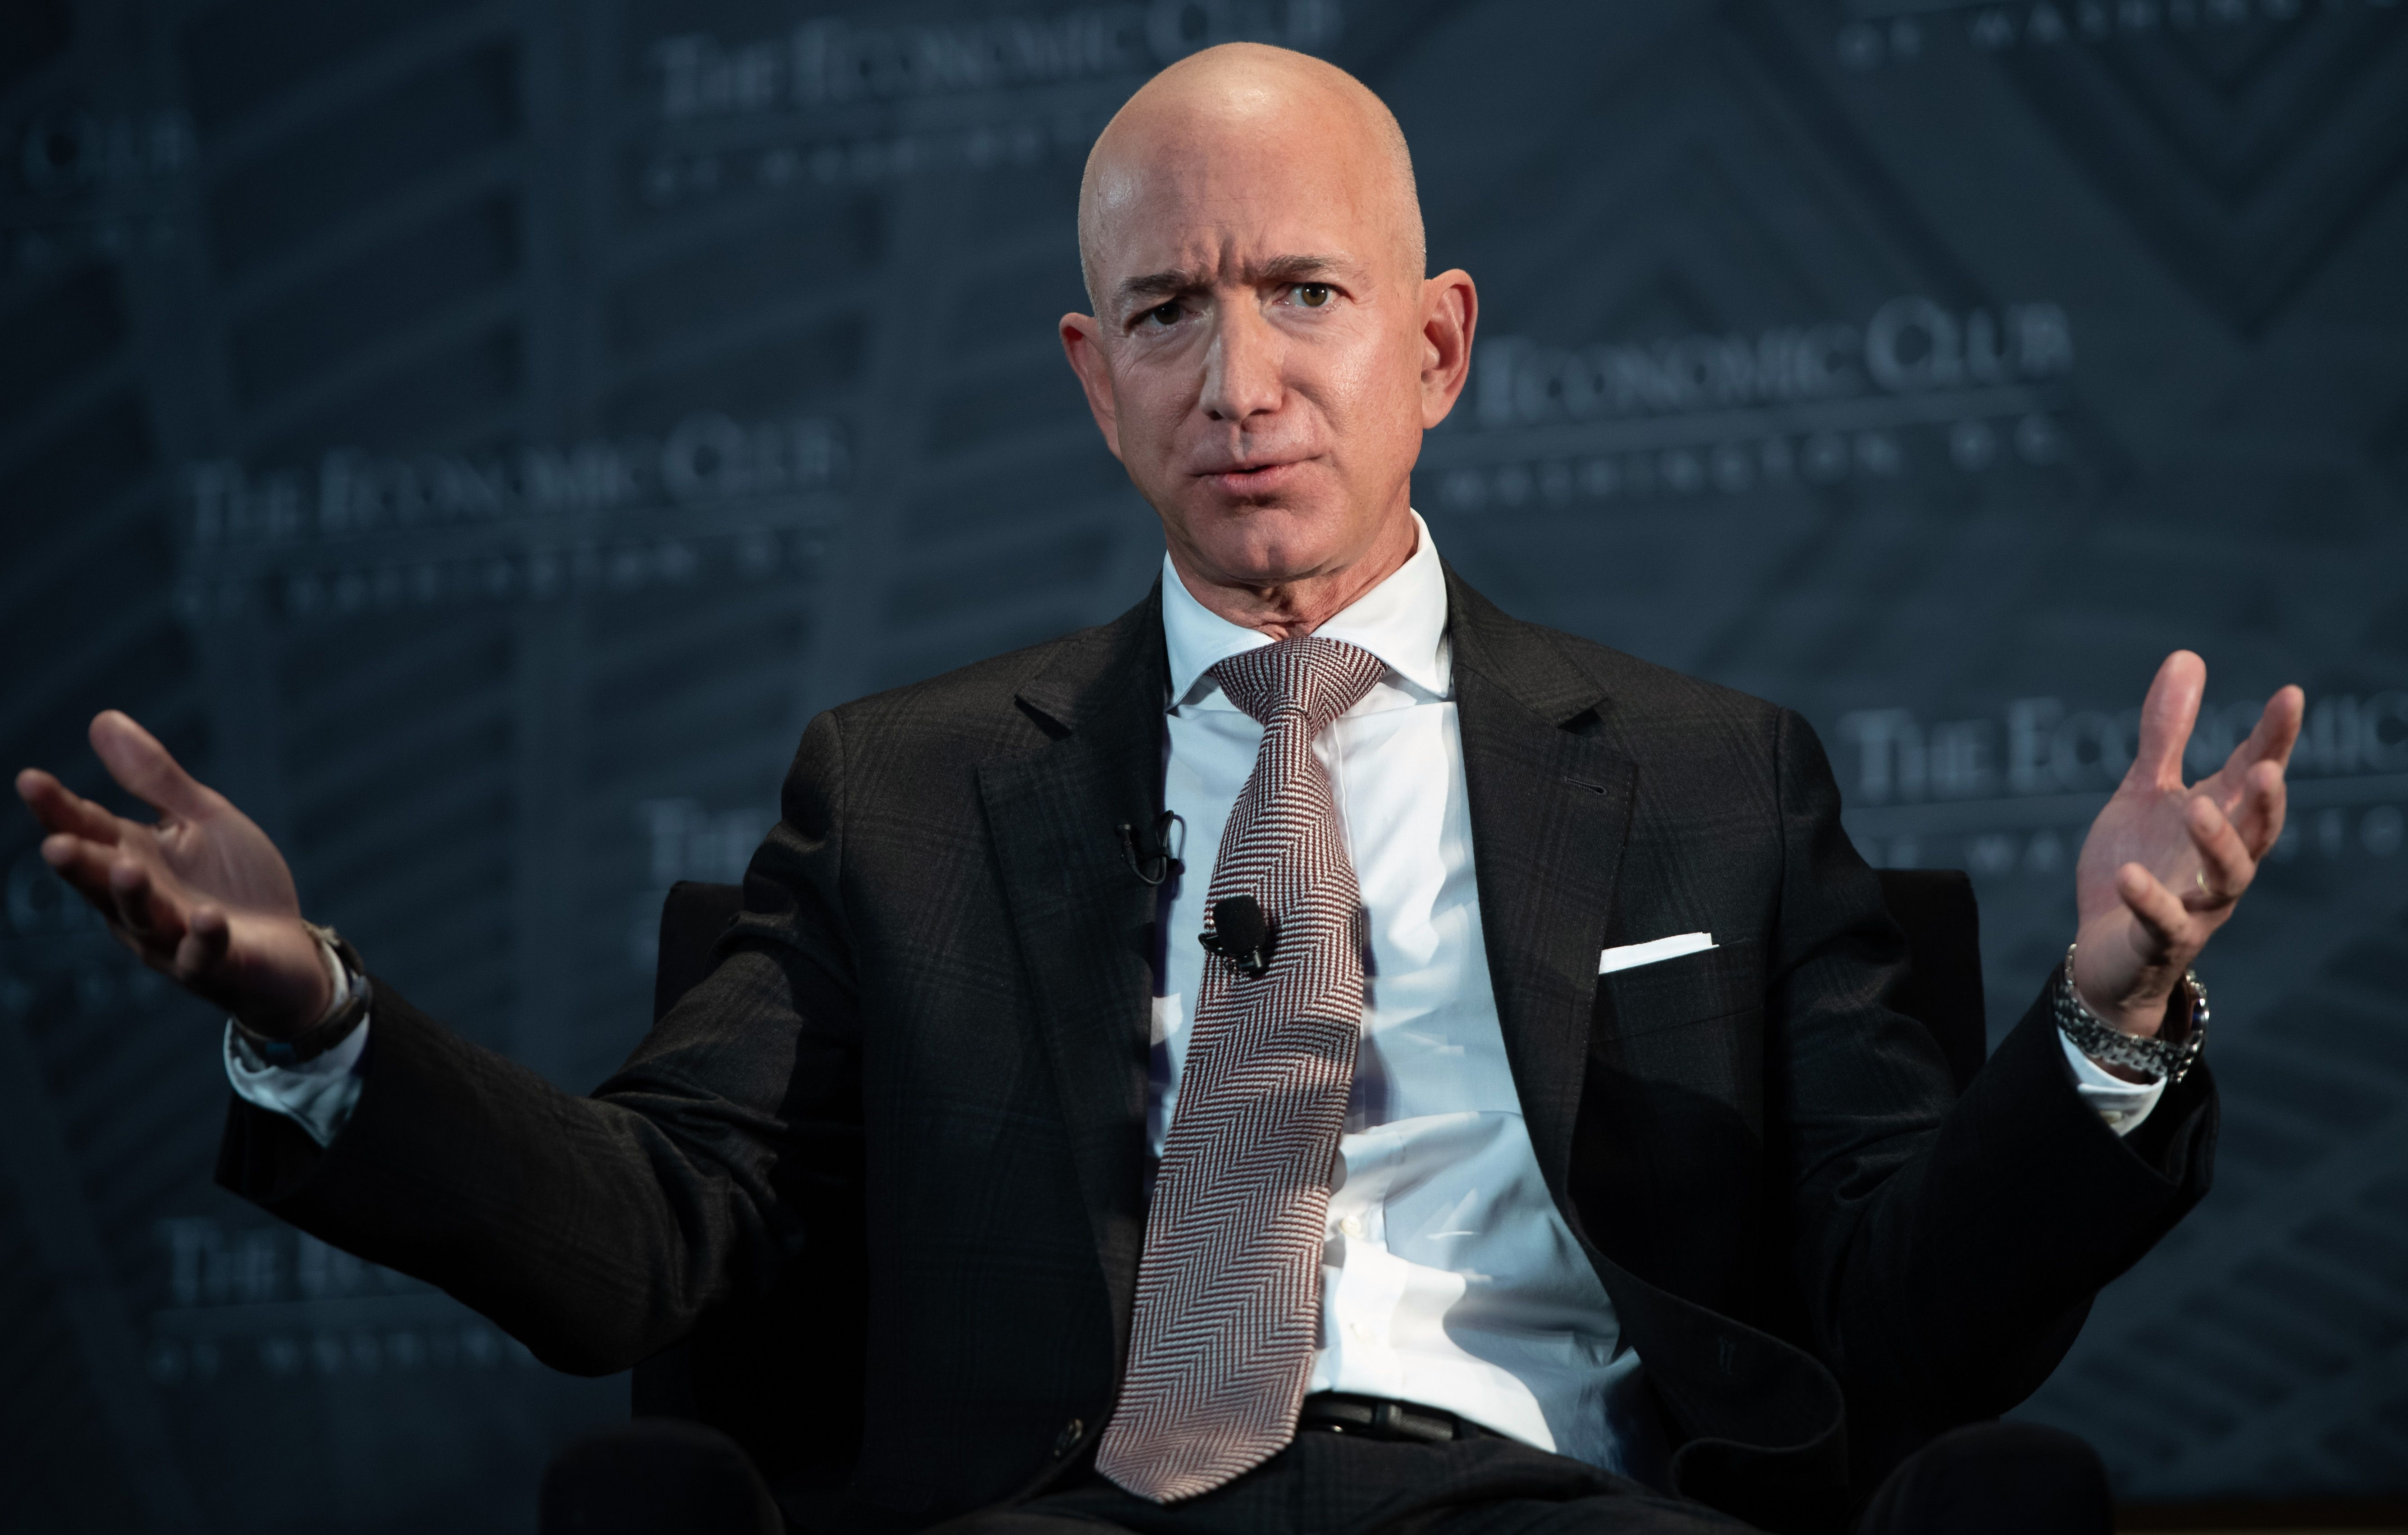 Report: Saudi Crown Prince MBS 'Personally' Hacked Jeff Bezos' Phone Via WhatsApp